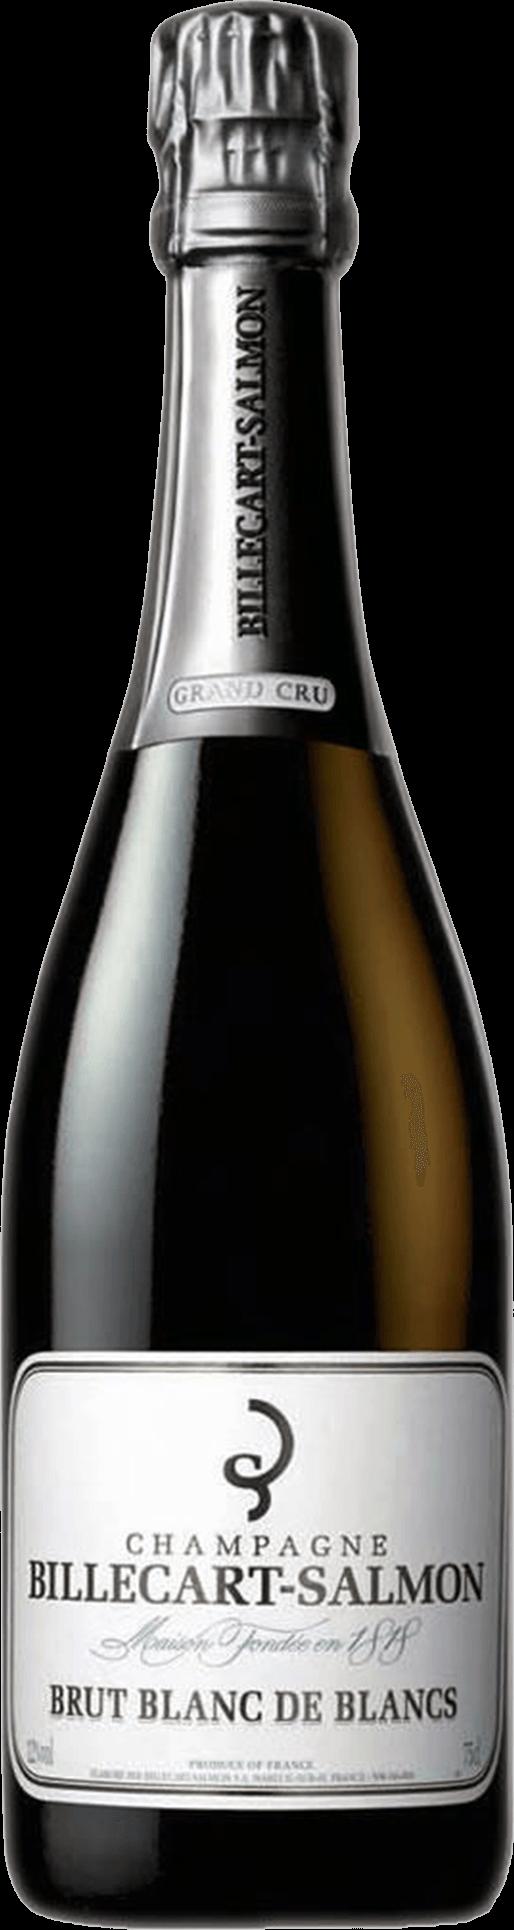 Billecart-Salmon - Brut Grand Cru Blanc de Blancs / 750mL